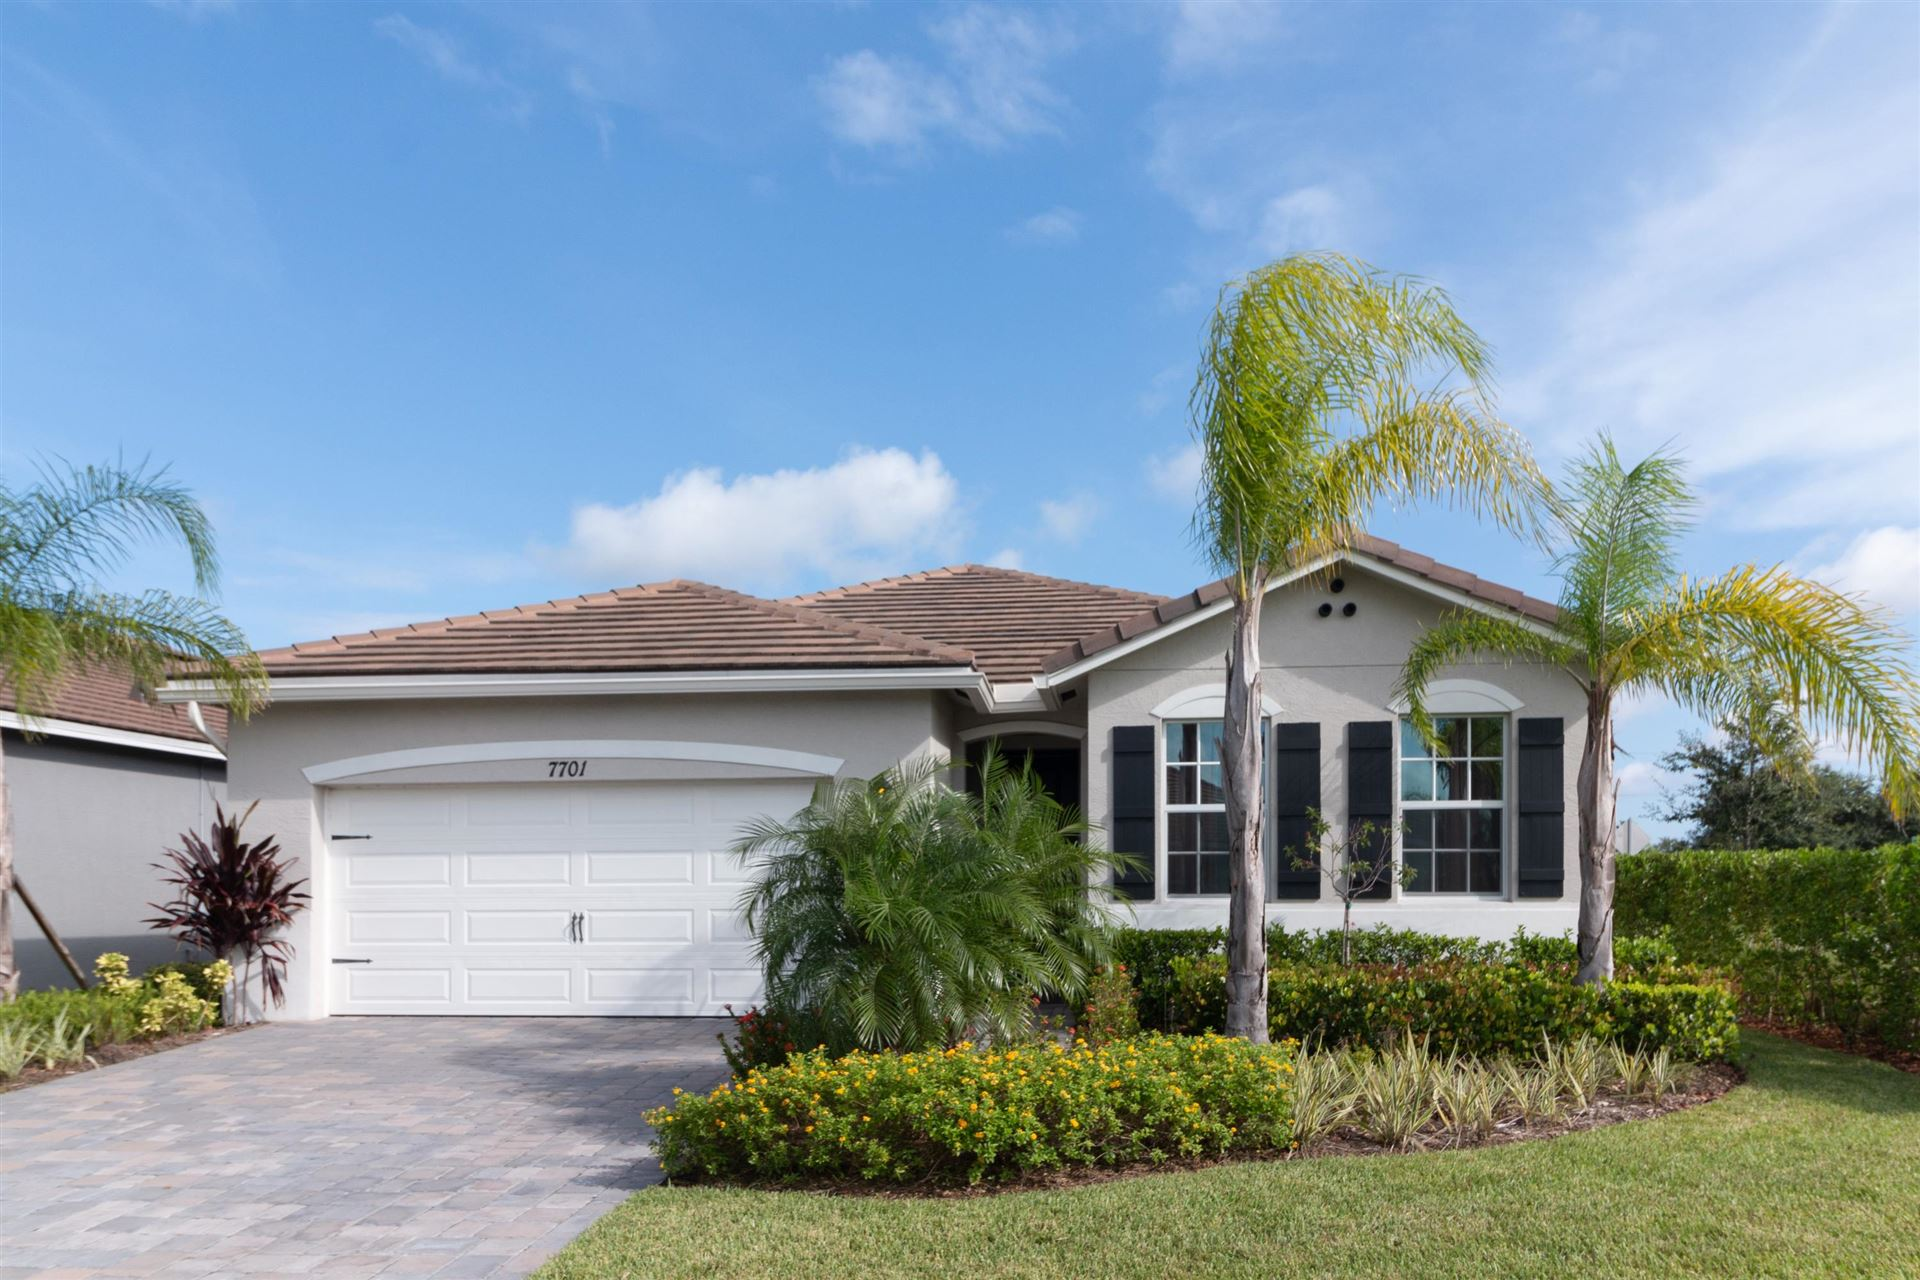 Photo of 7701 SW Harbor Cove Drive, Stuart, FL 34997 (MLS # RX-10643676)